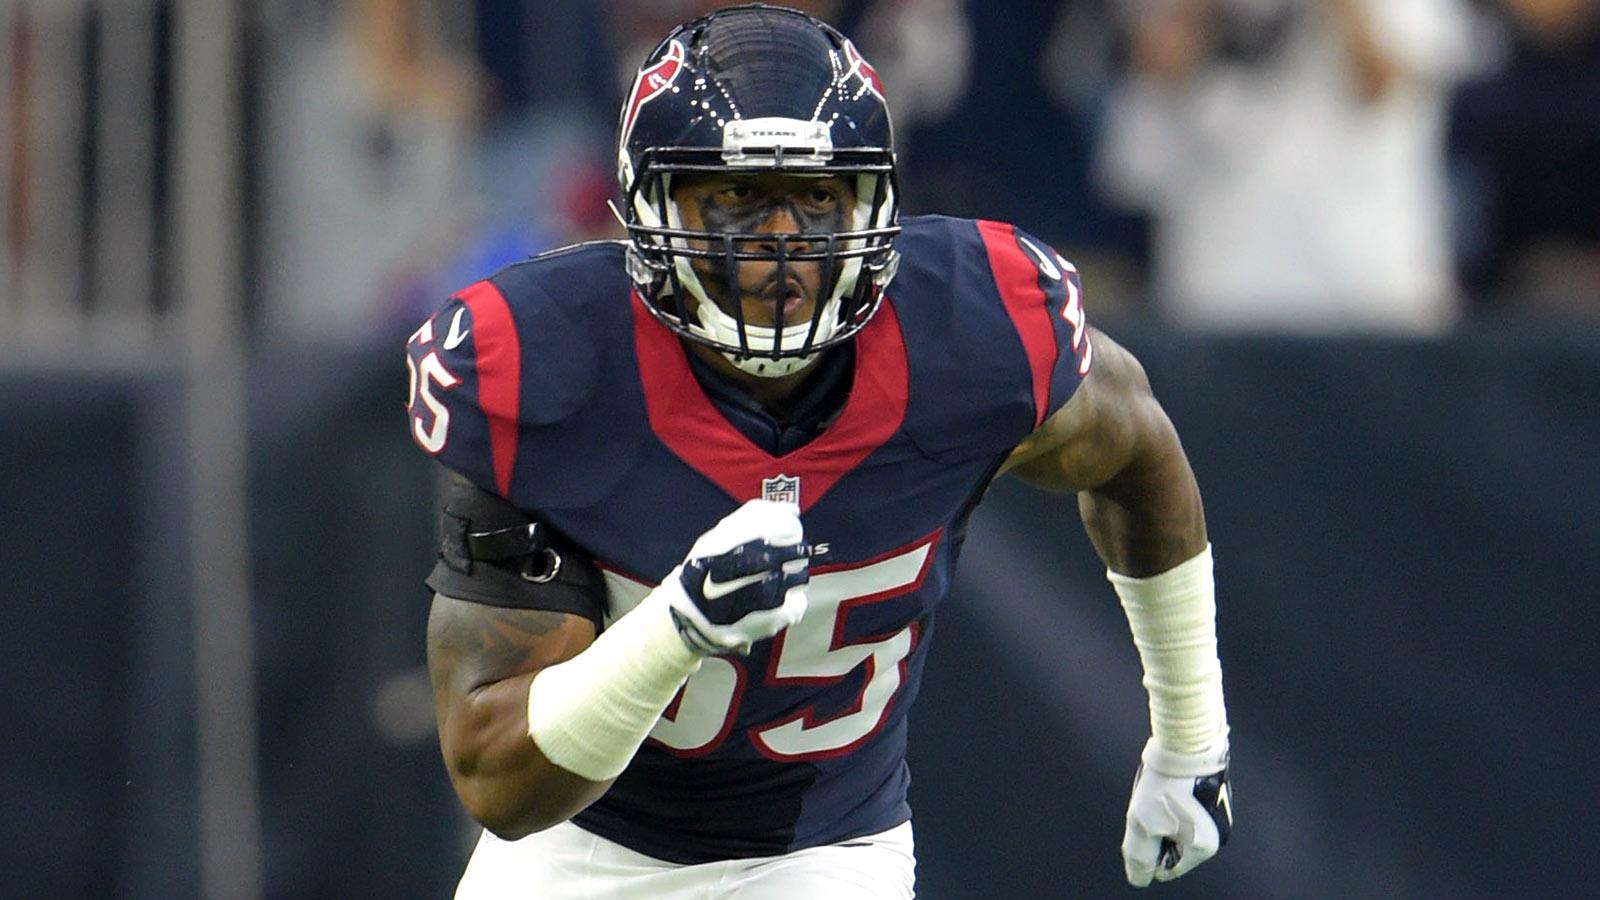 Report: Houston LB Benardrick McKinney has sprained MCL